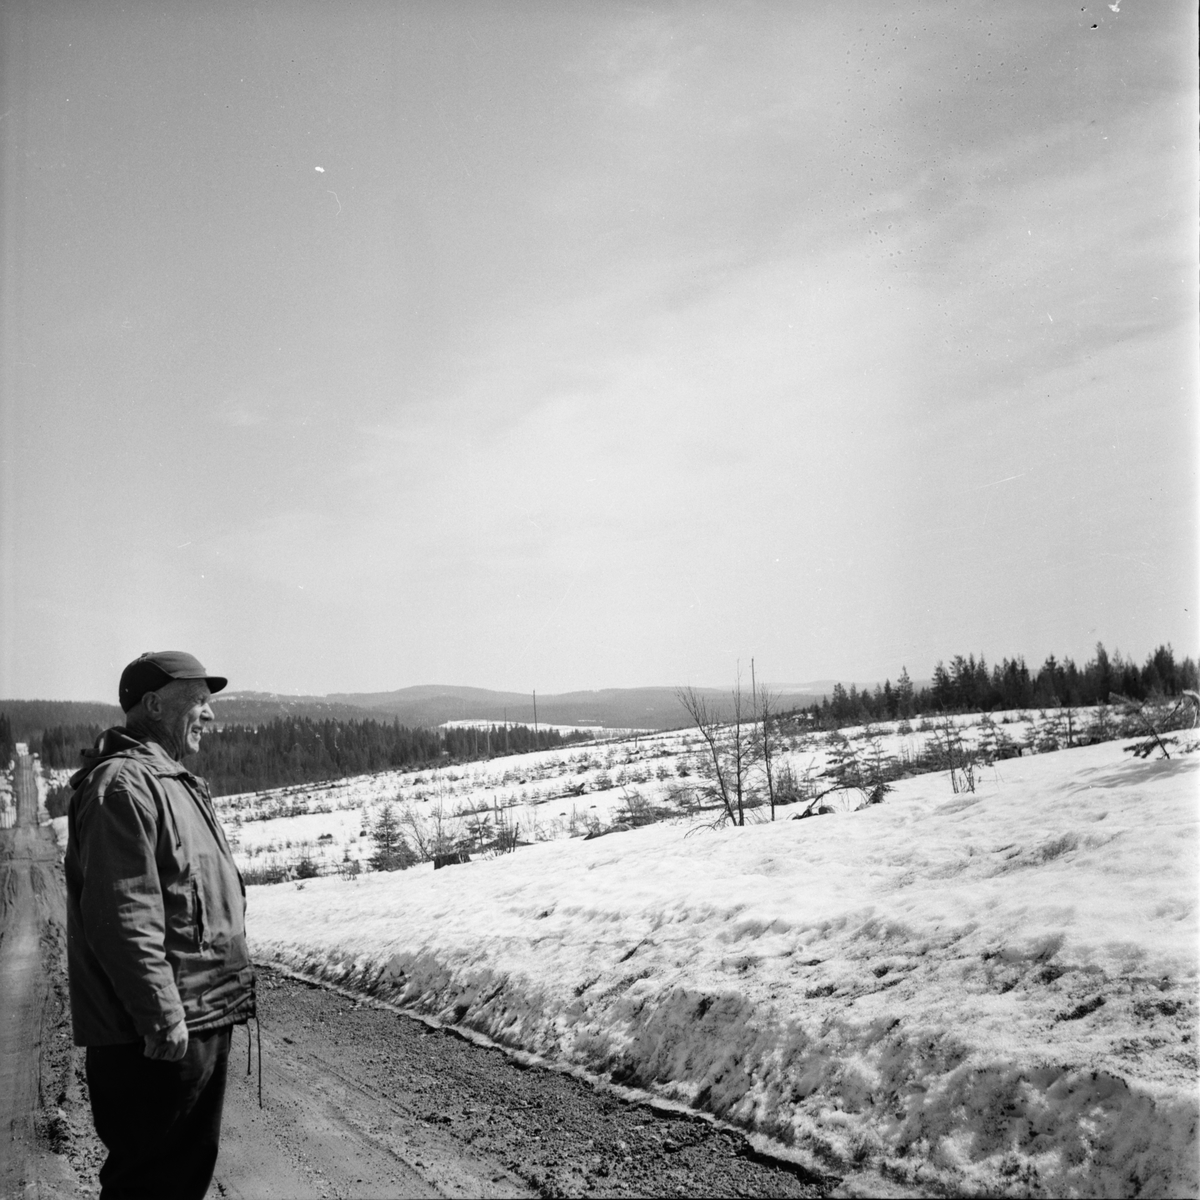 Sjösveden. Rimbo-Erik. 3/5-1966